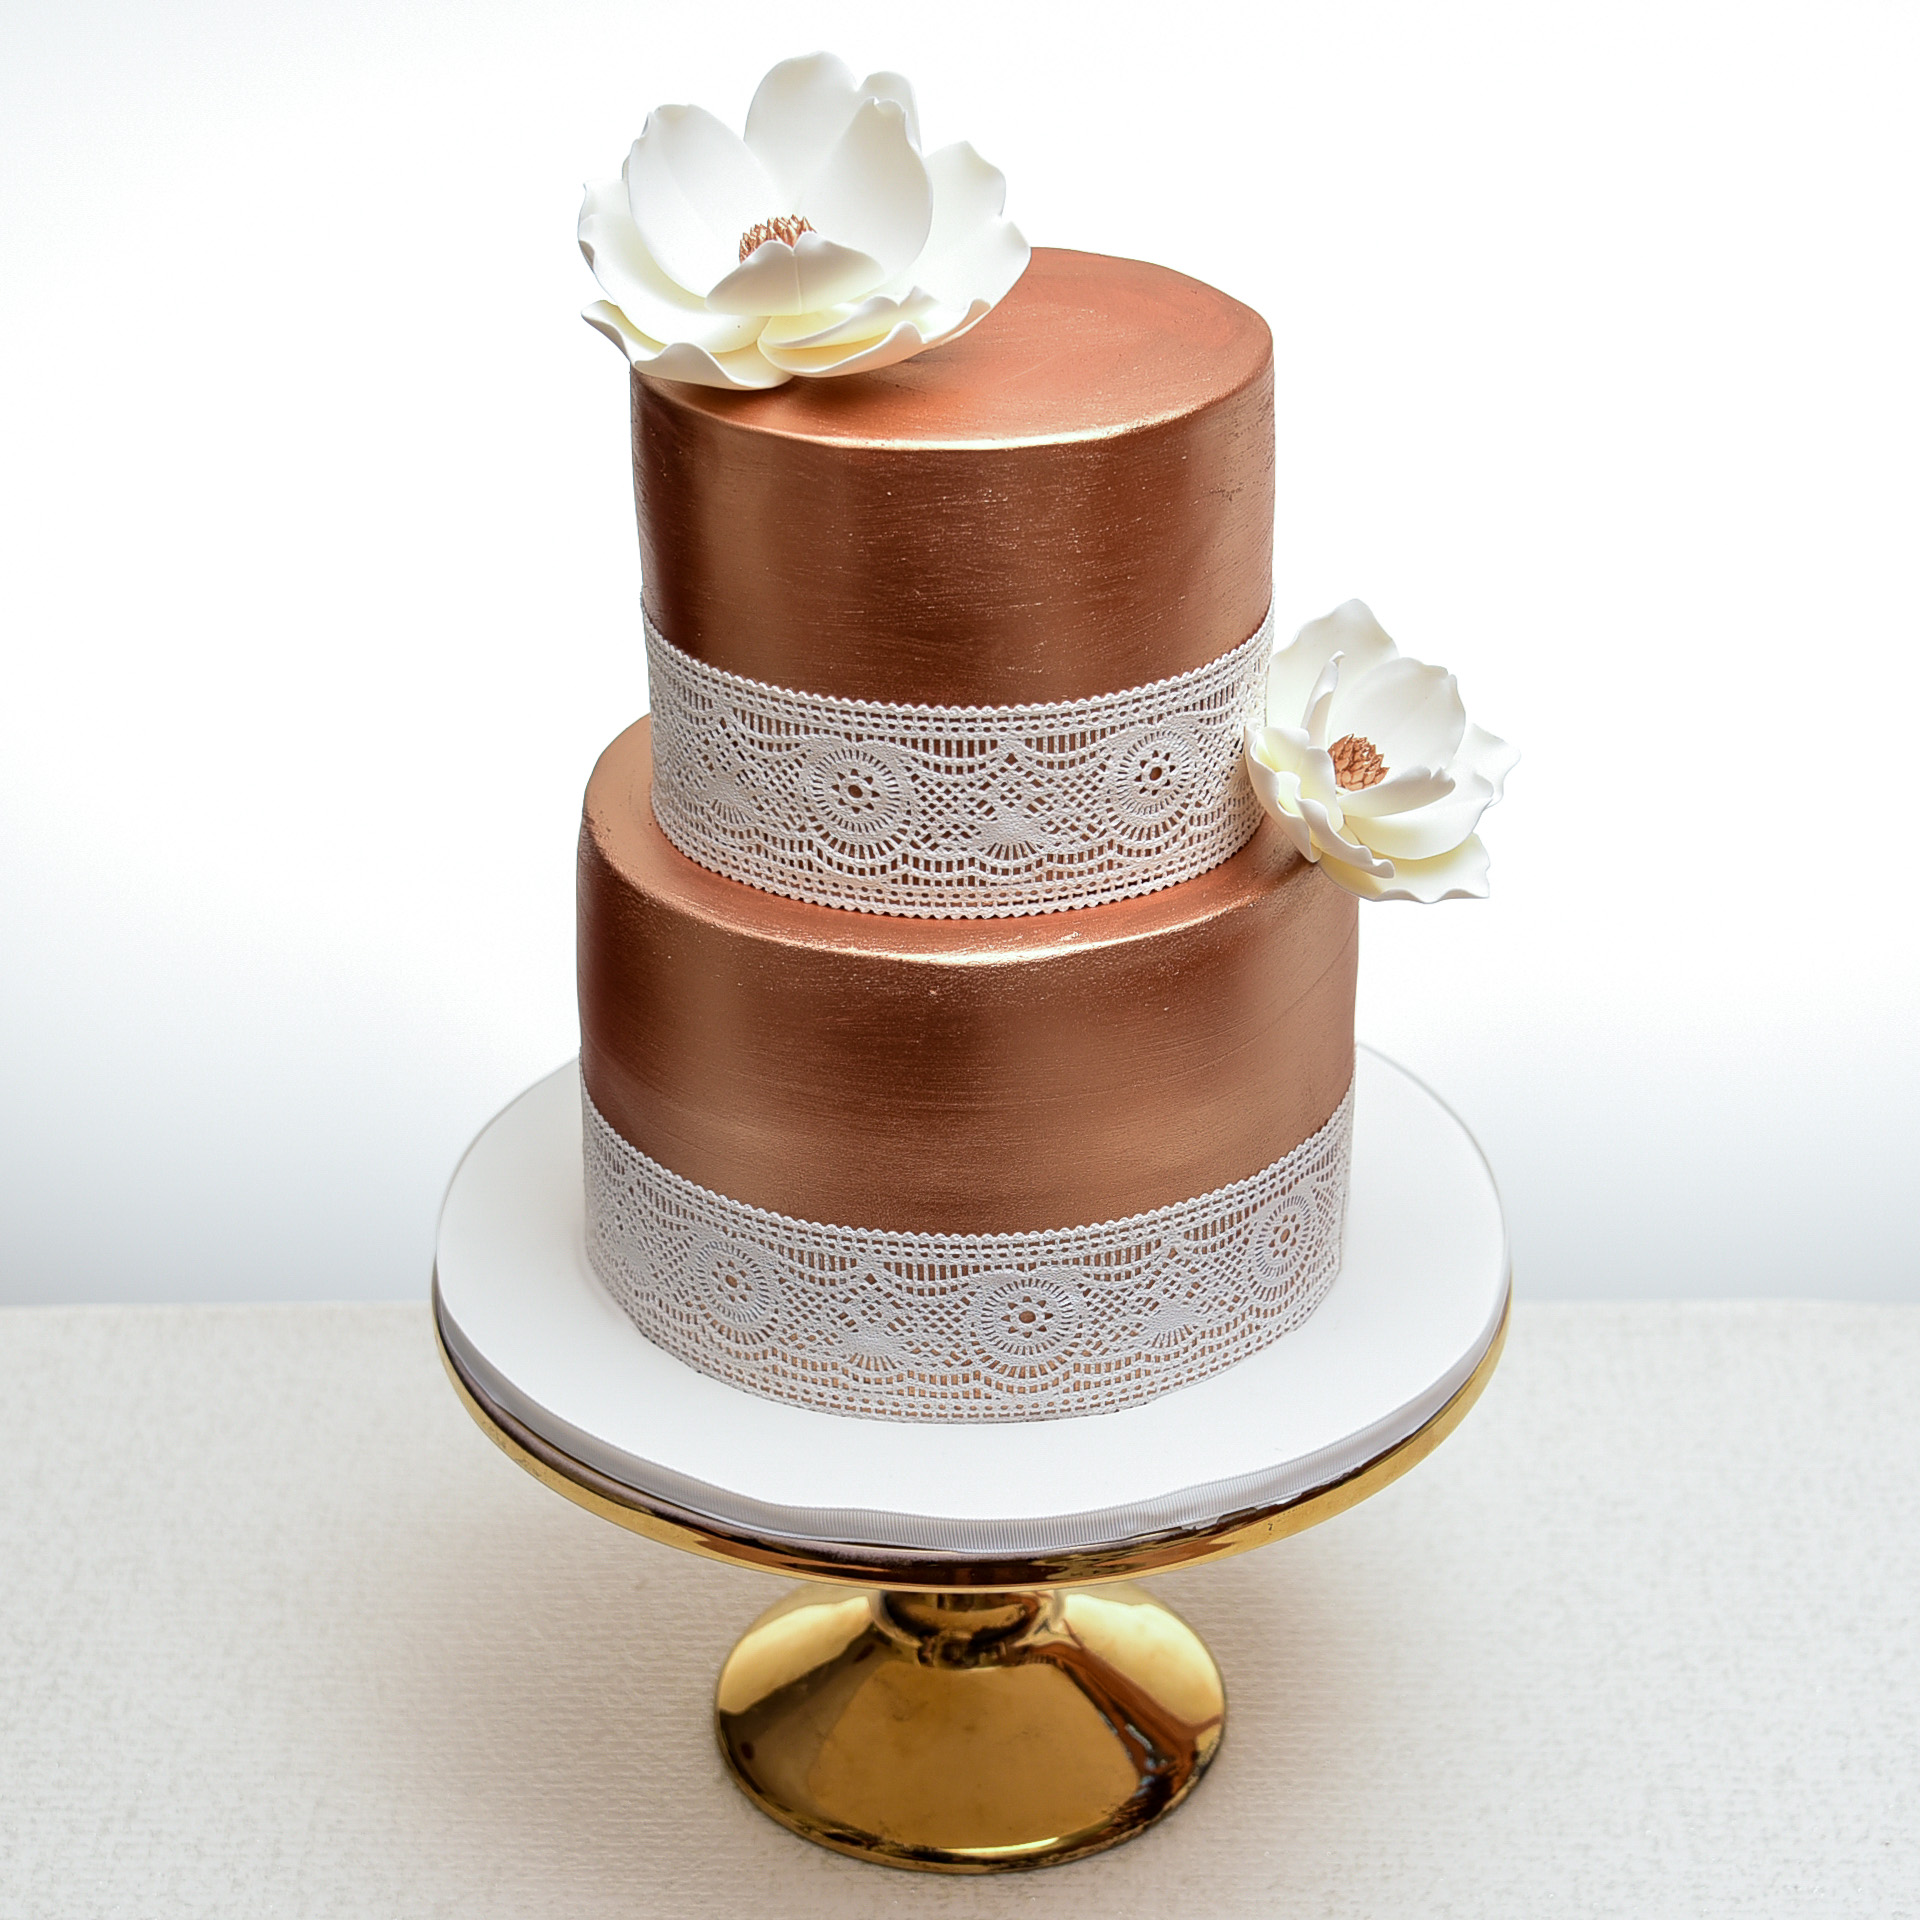 Bronze-Communion-Religious-Cake.jpg